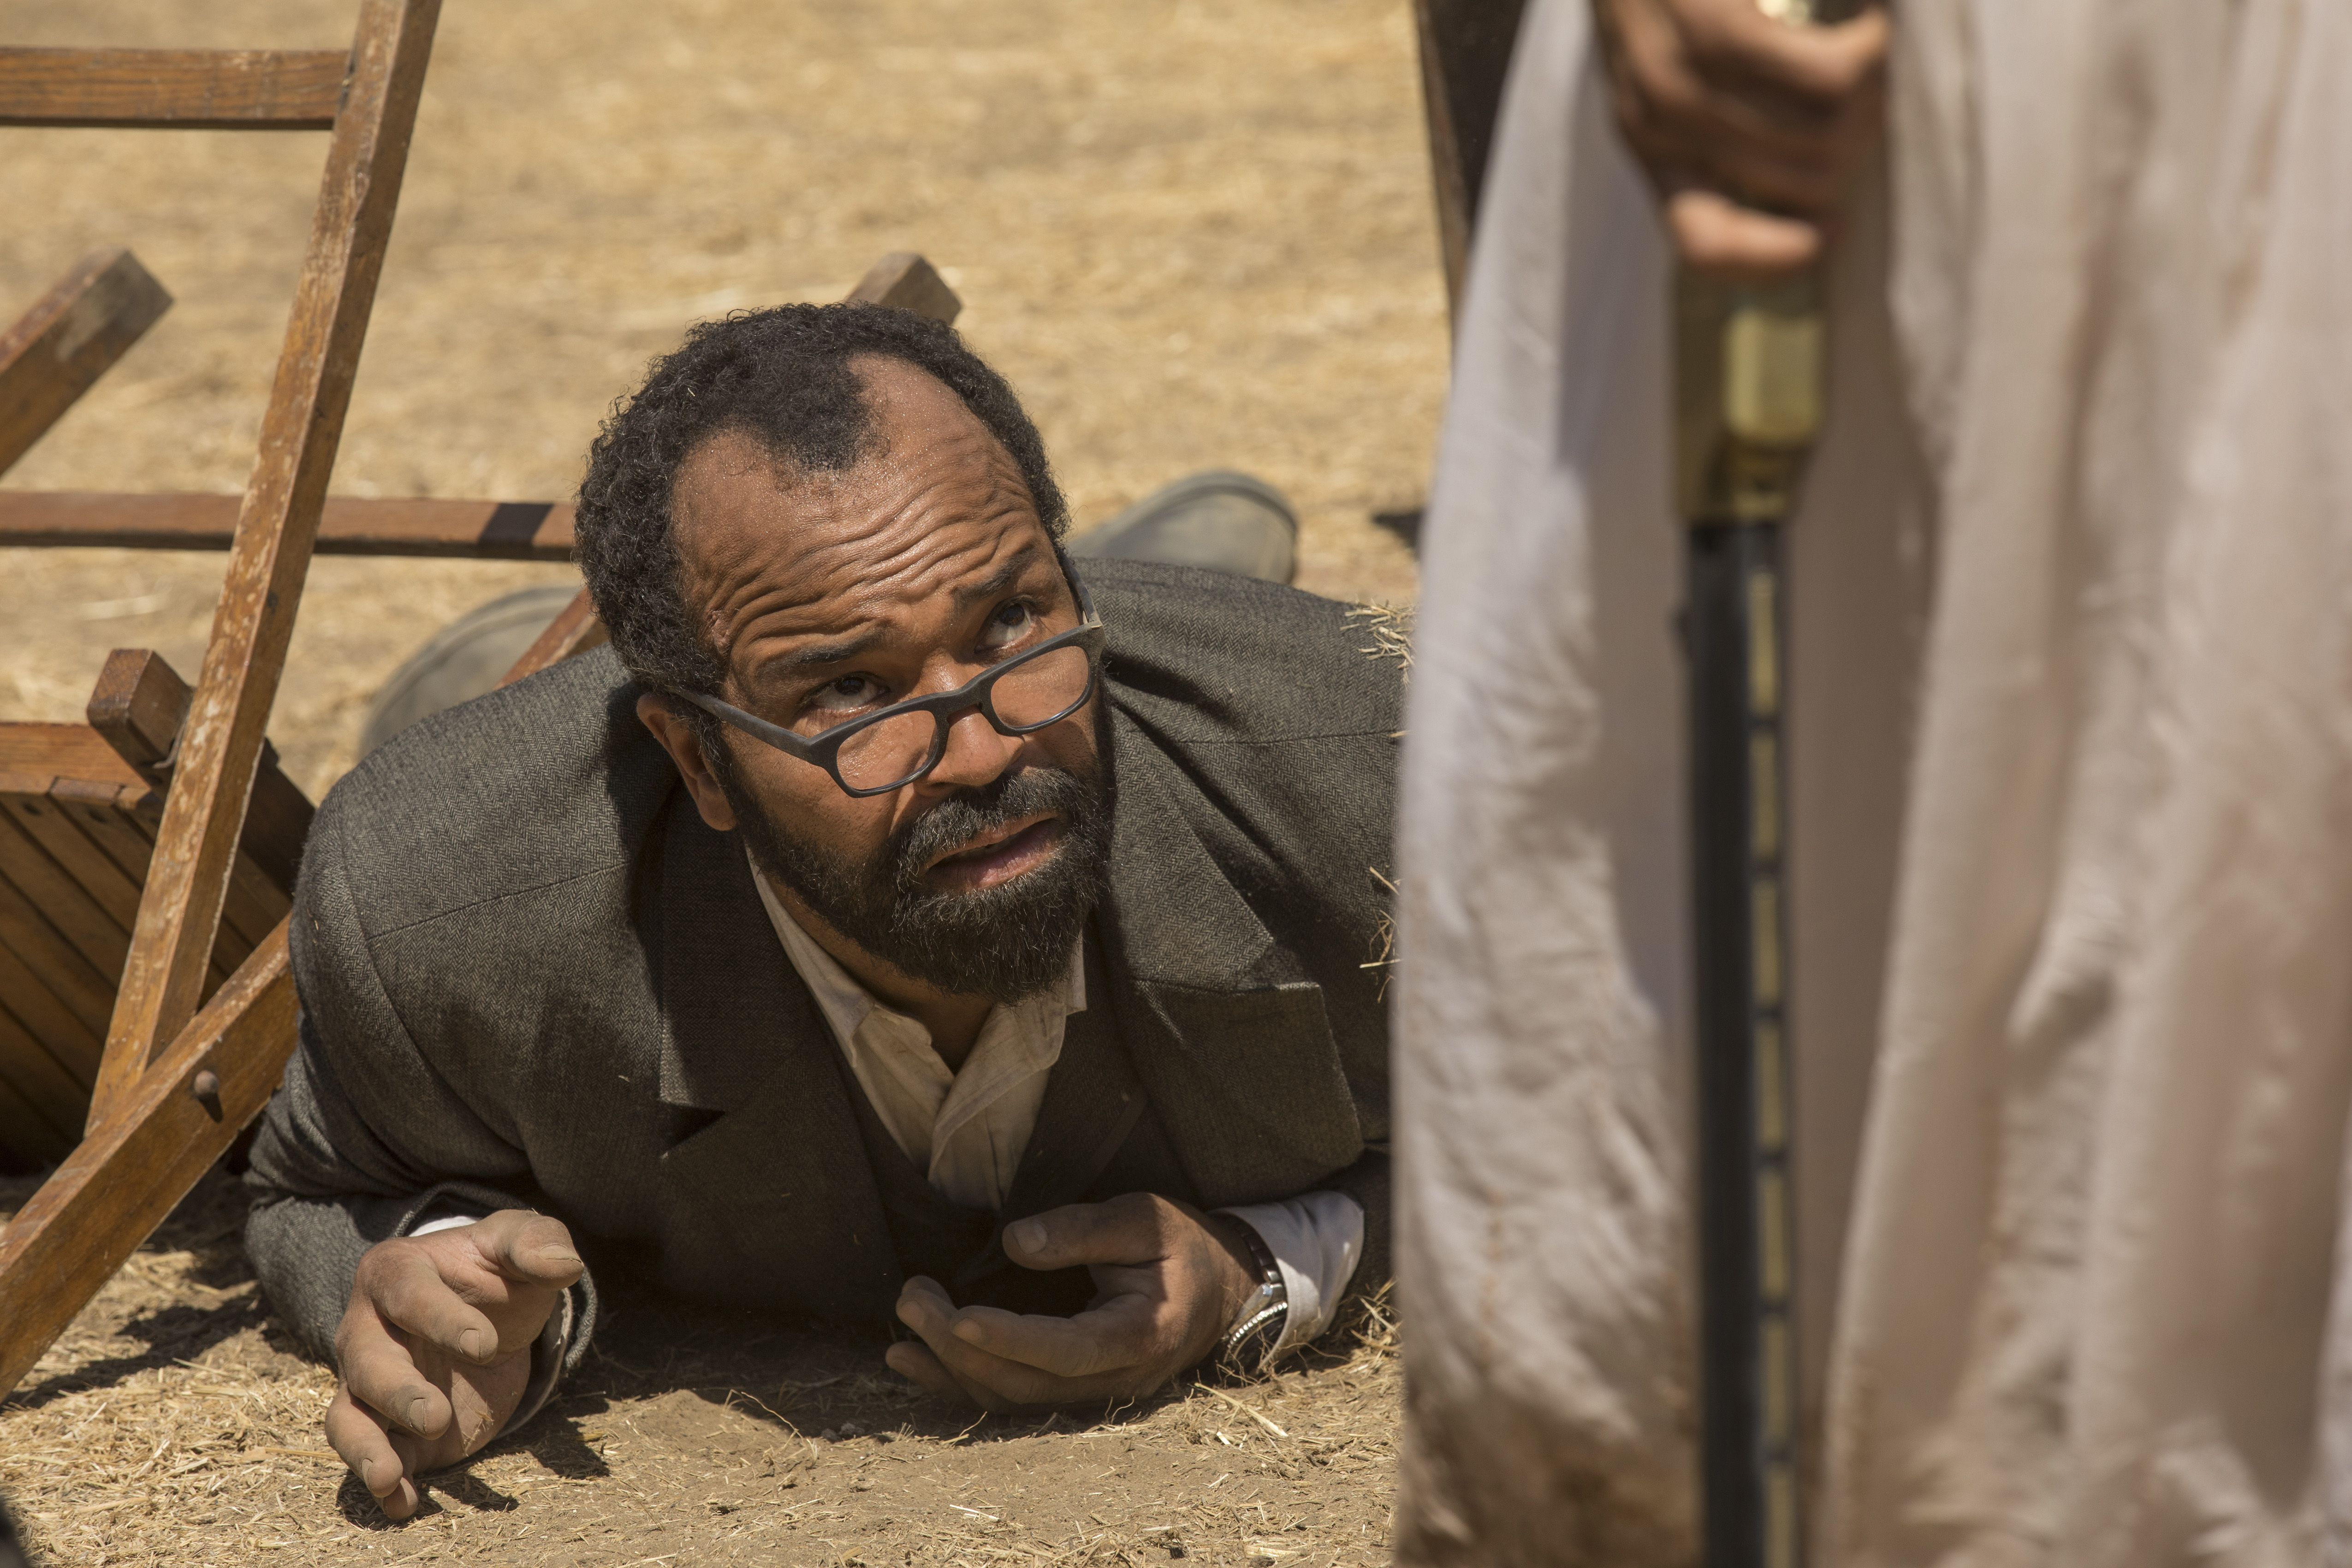 Westworld Episode 3 Recap